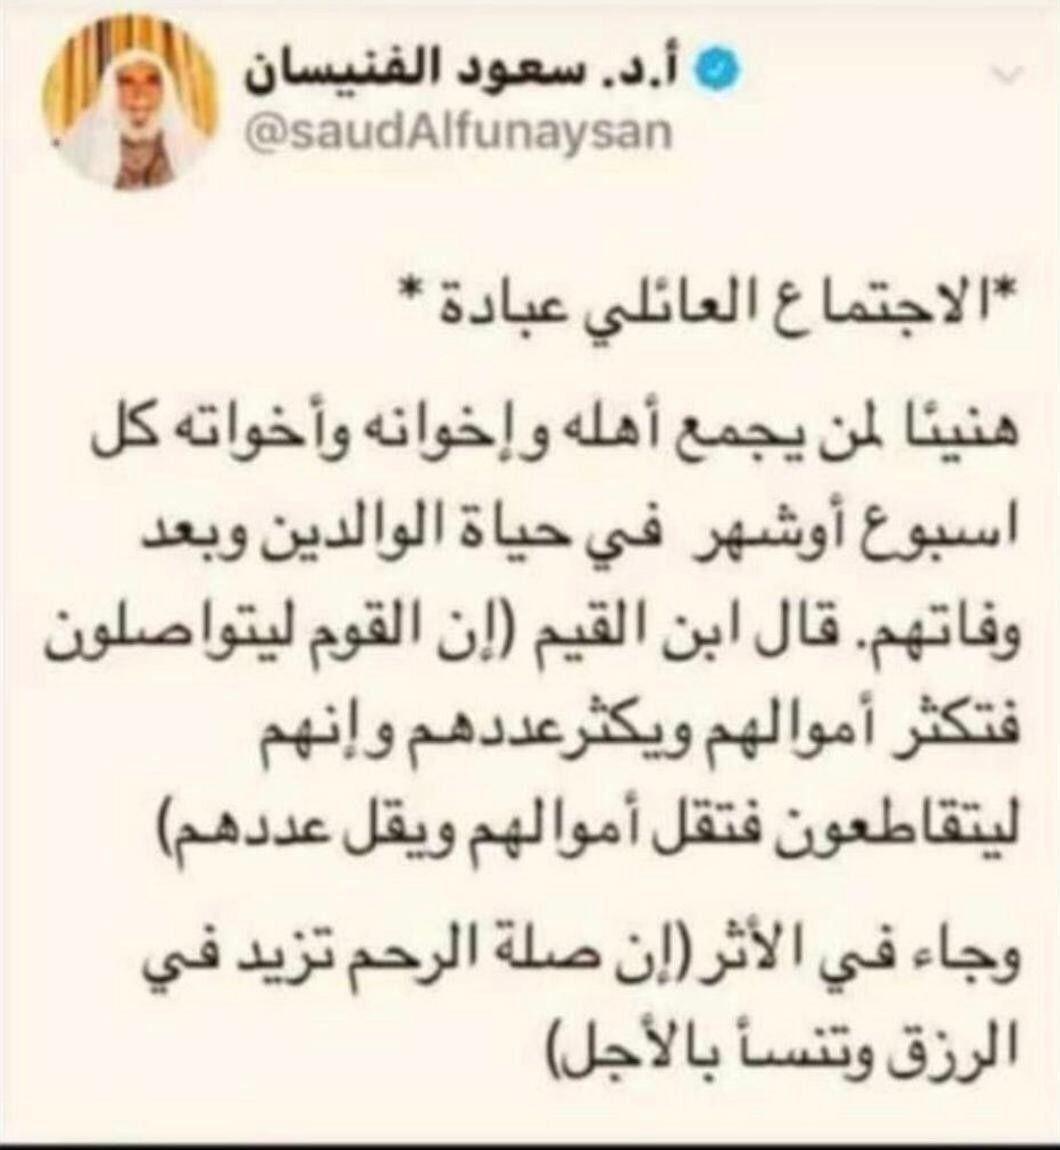 Pin By Iman Yousef On أقوال العلماء In 2021 Math Arabic Calligraphy Math Equations